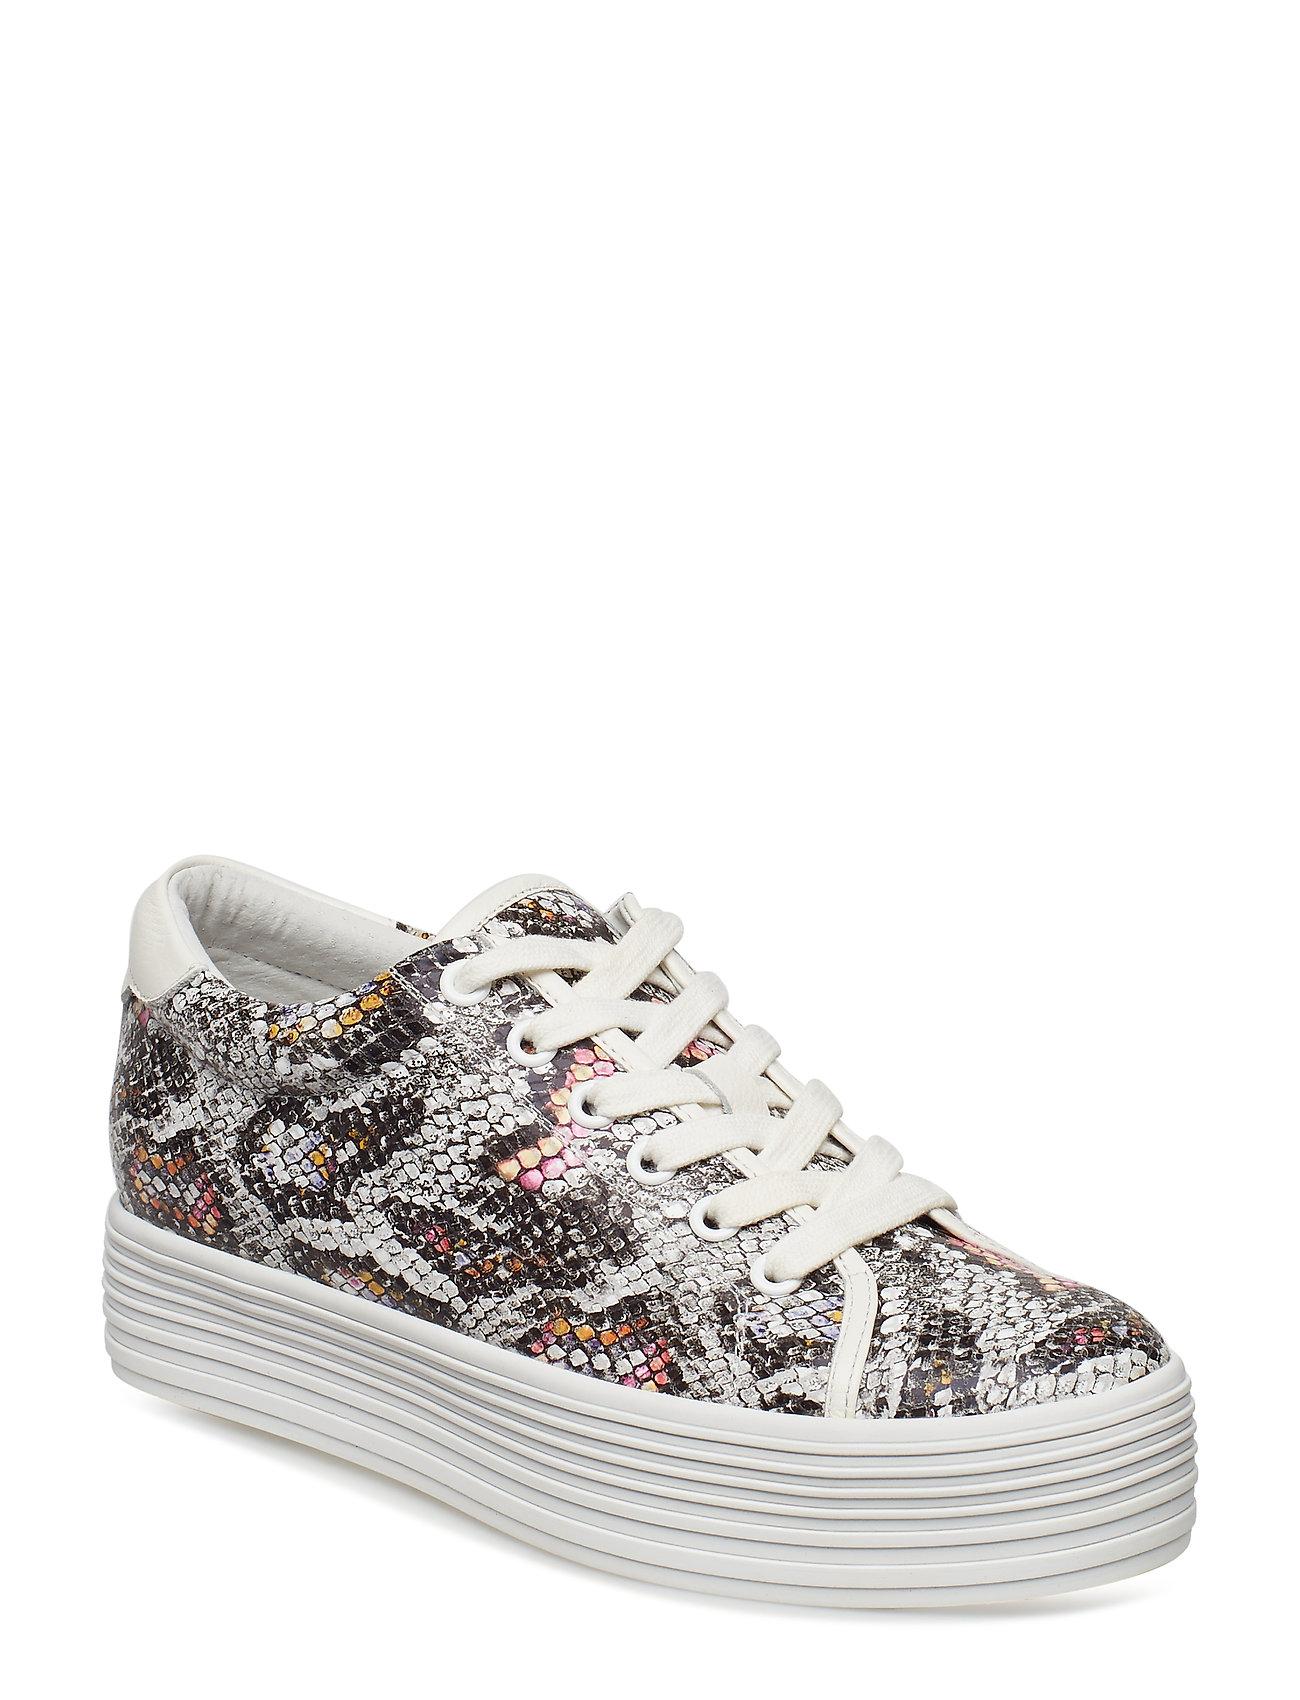 Bella L Sneakers Plateau Hvid Shoe The Bear